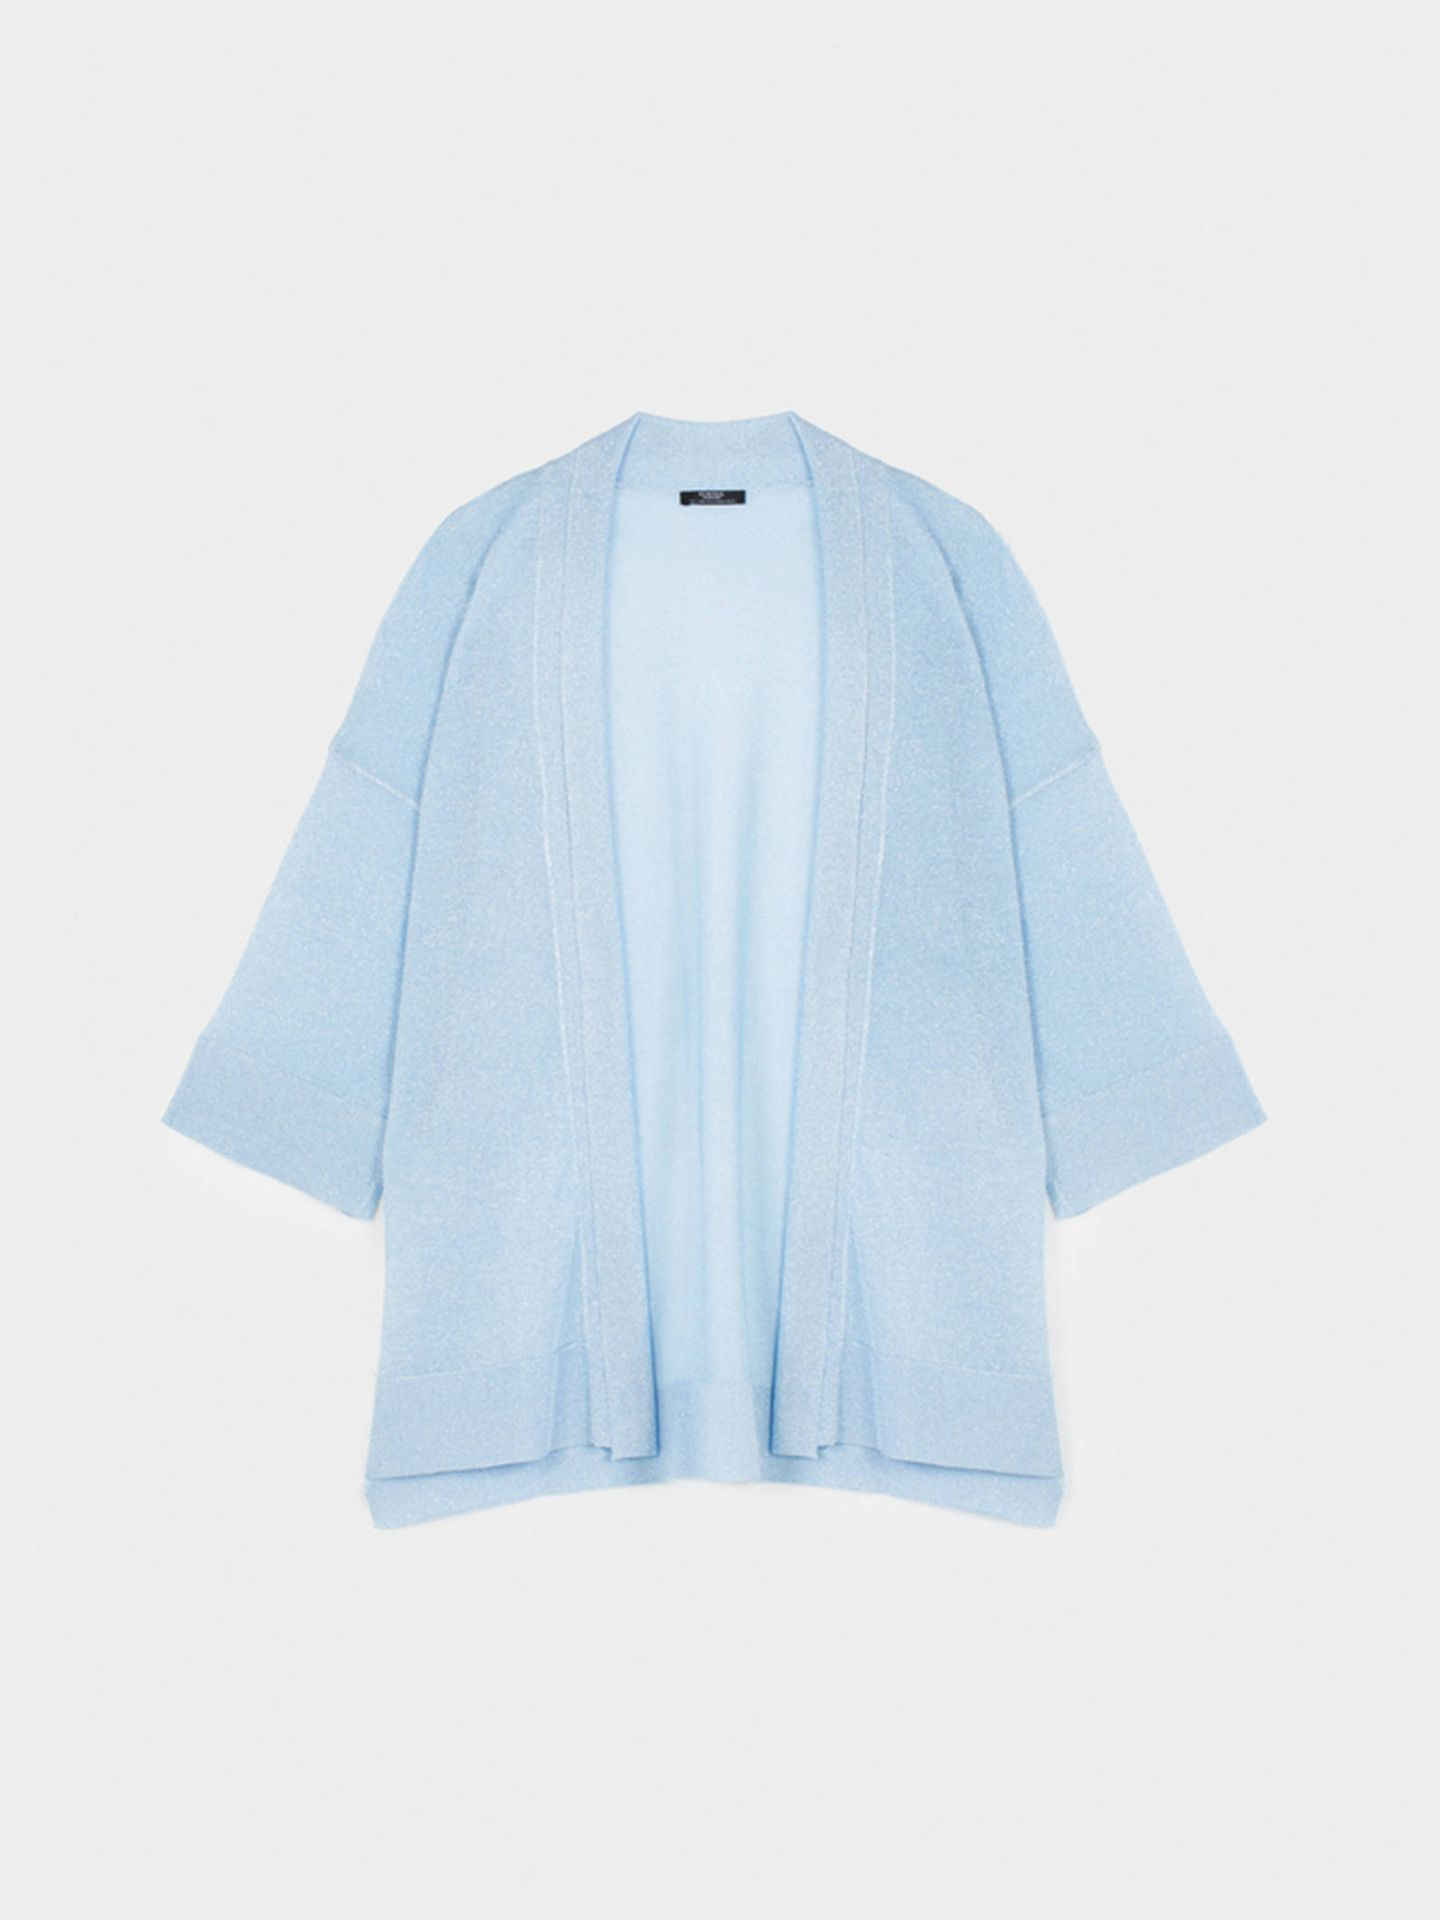 Kimono azul de Parfois. (Cortesía)